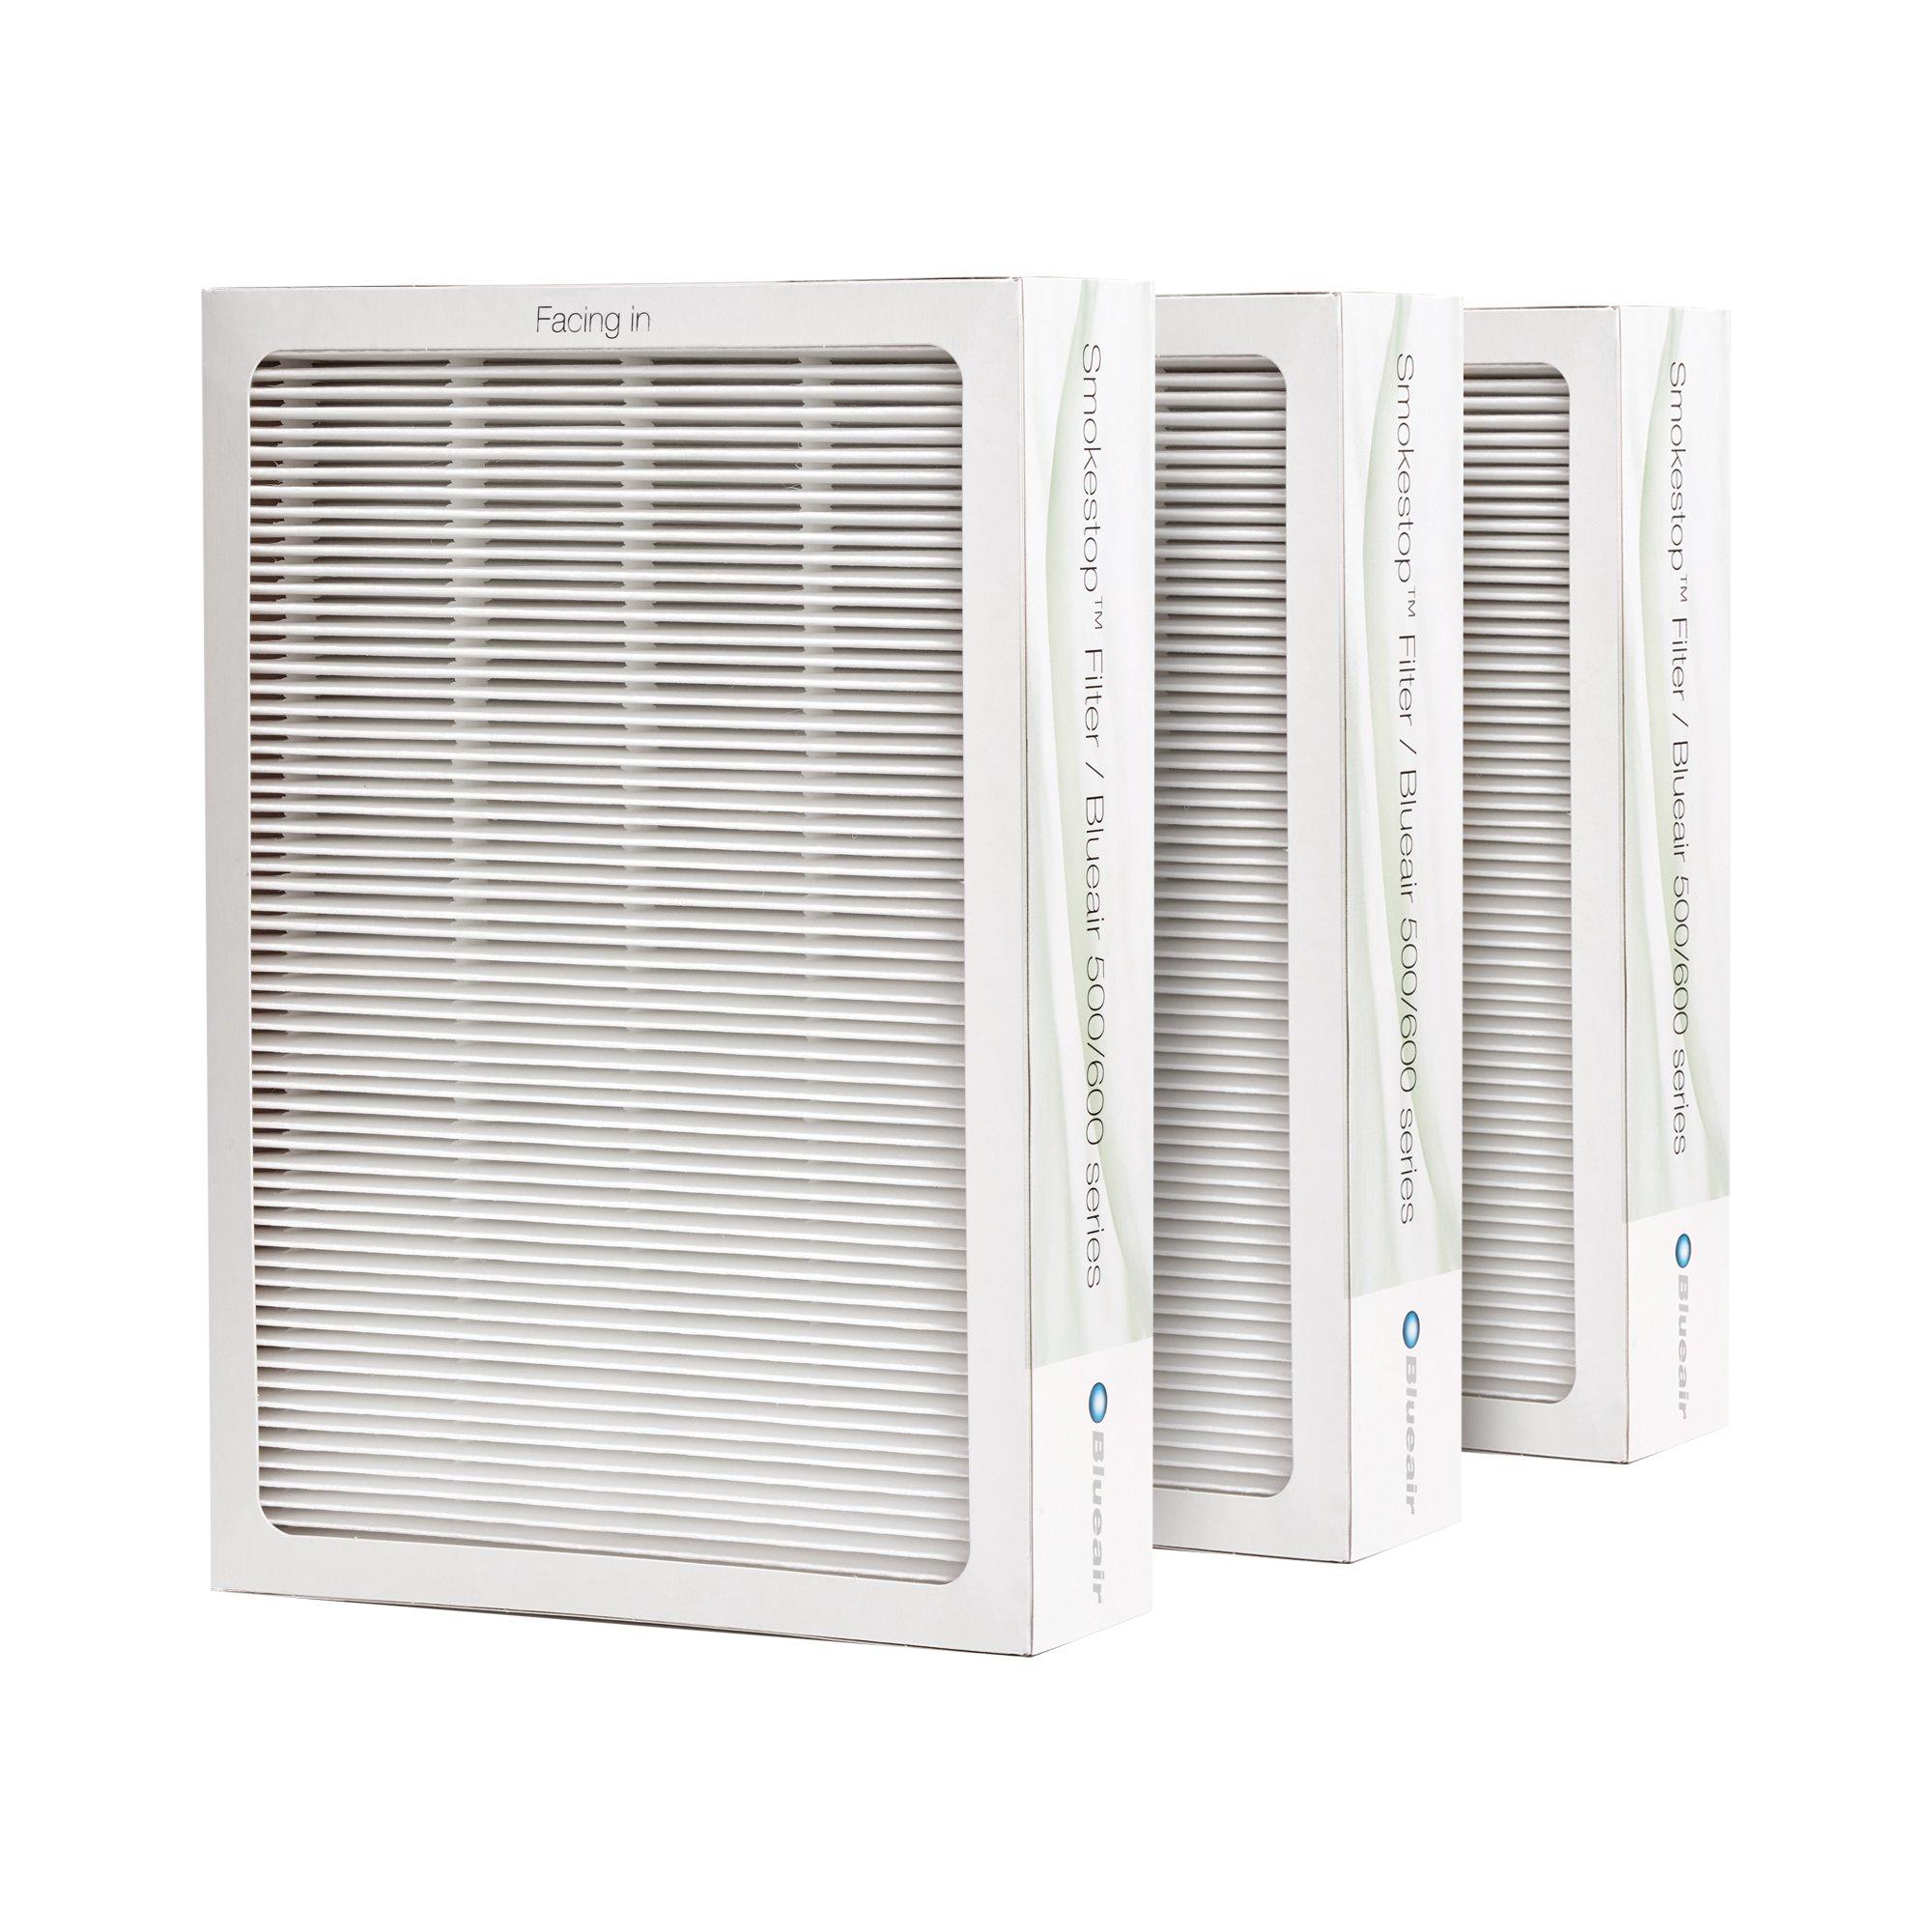 Blueair Classic Replacement Filter, 500/600 Series Genuine SmokeStop Filter, Odor Removal Classic 501, 503, 510, 550E, 555EB, 601, 603, 650E, 505, 605